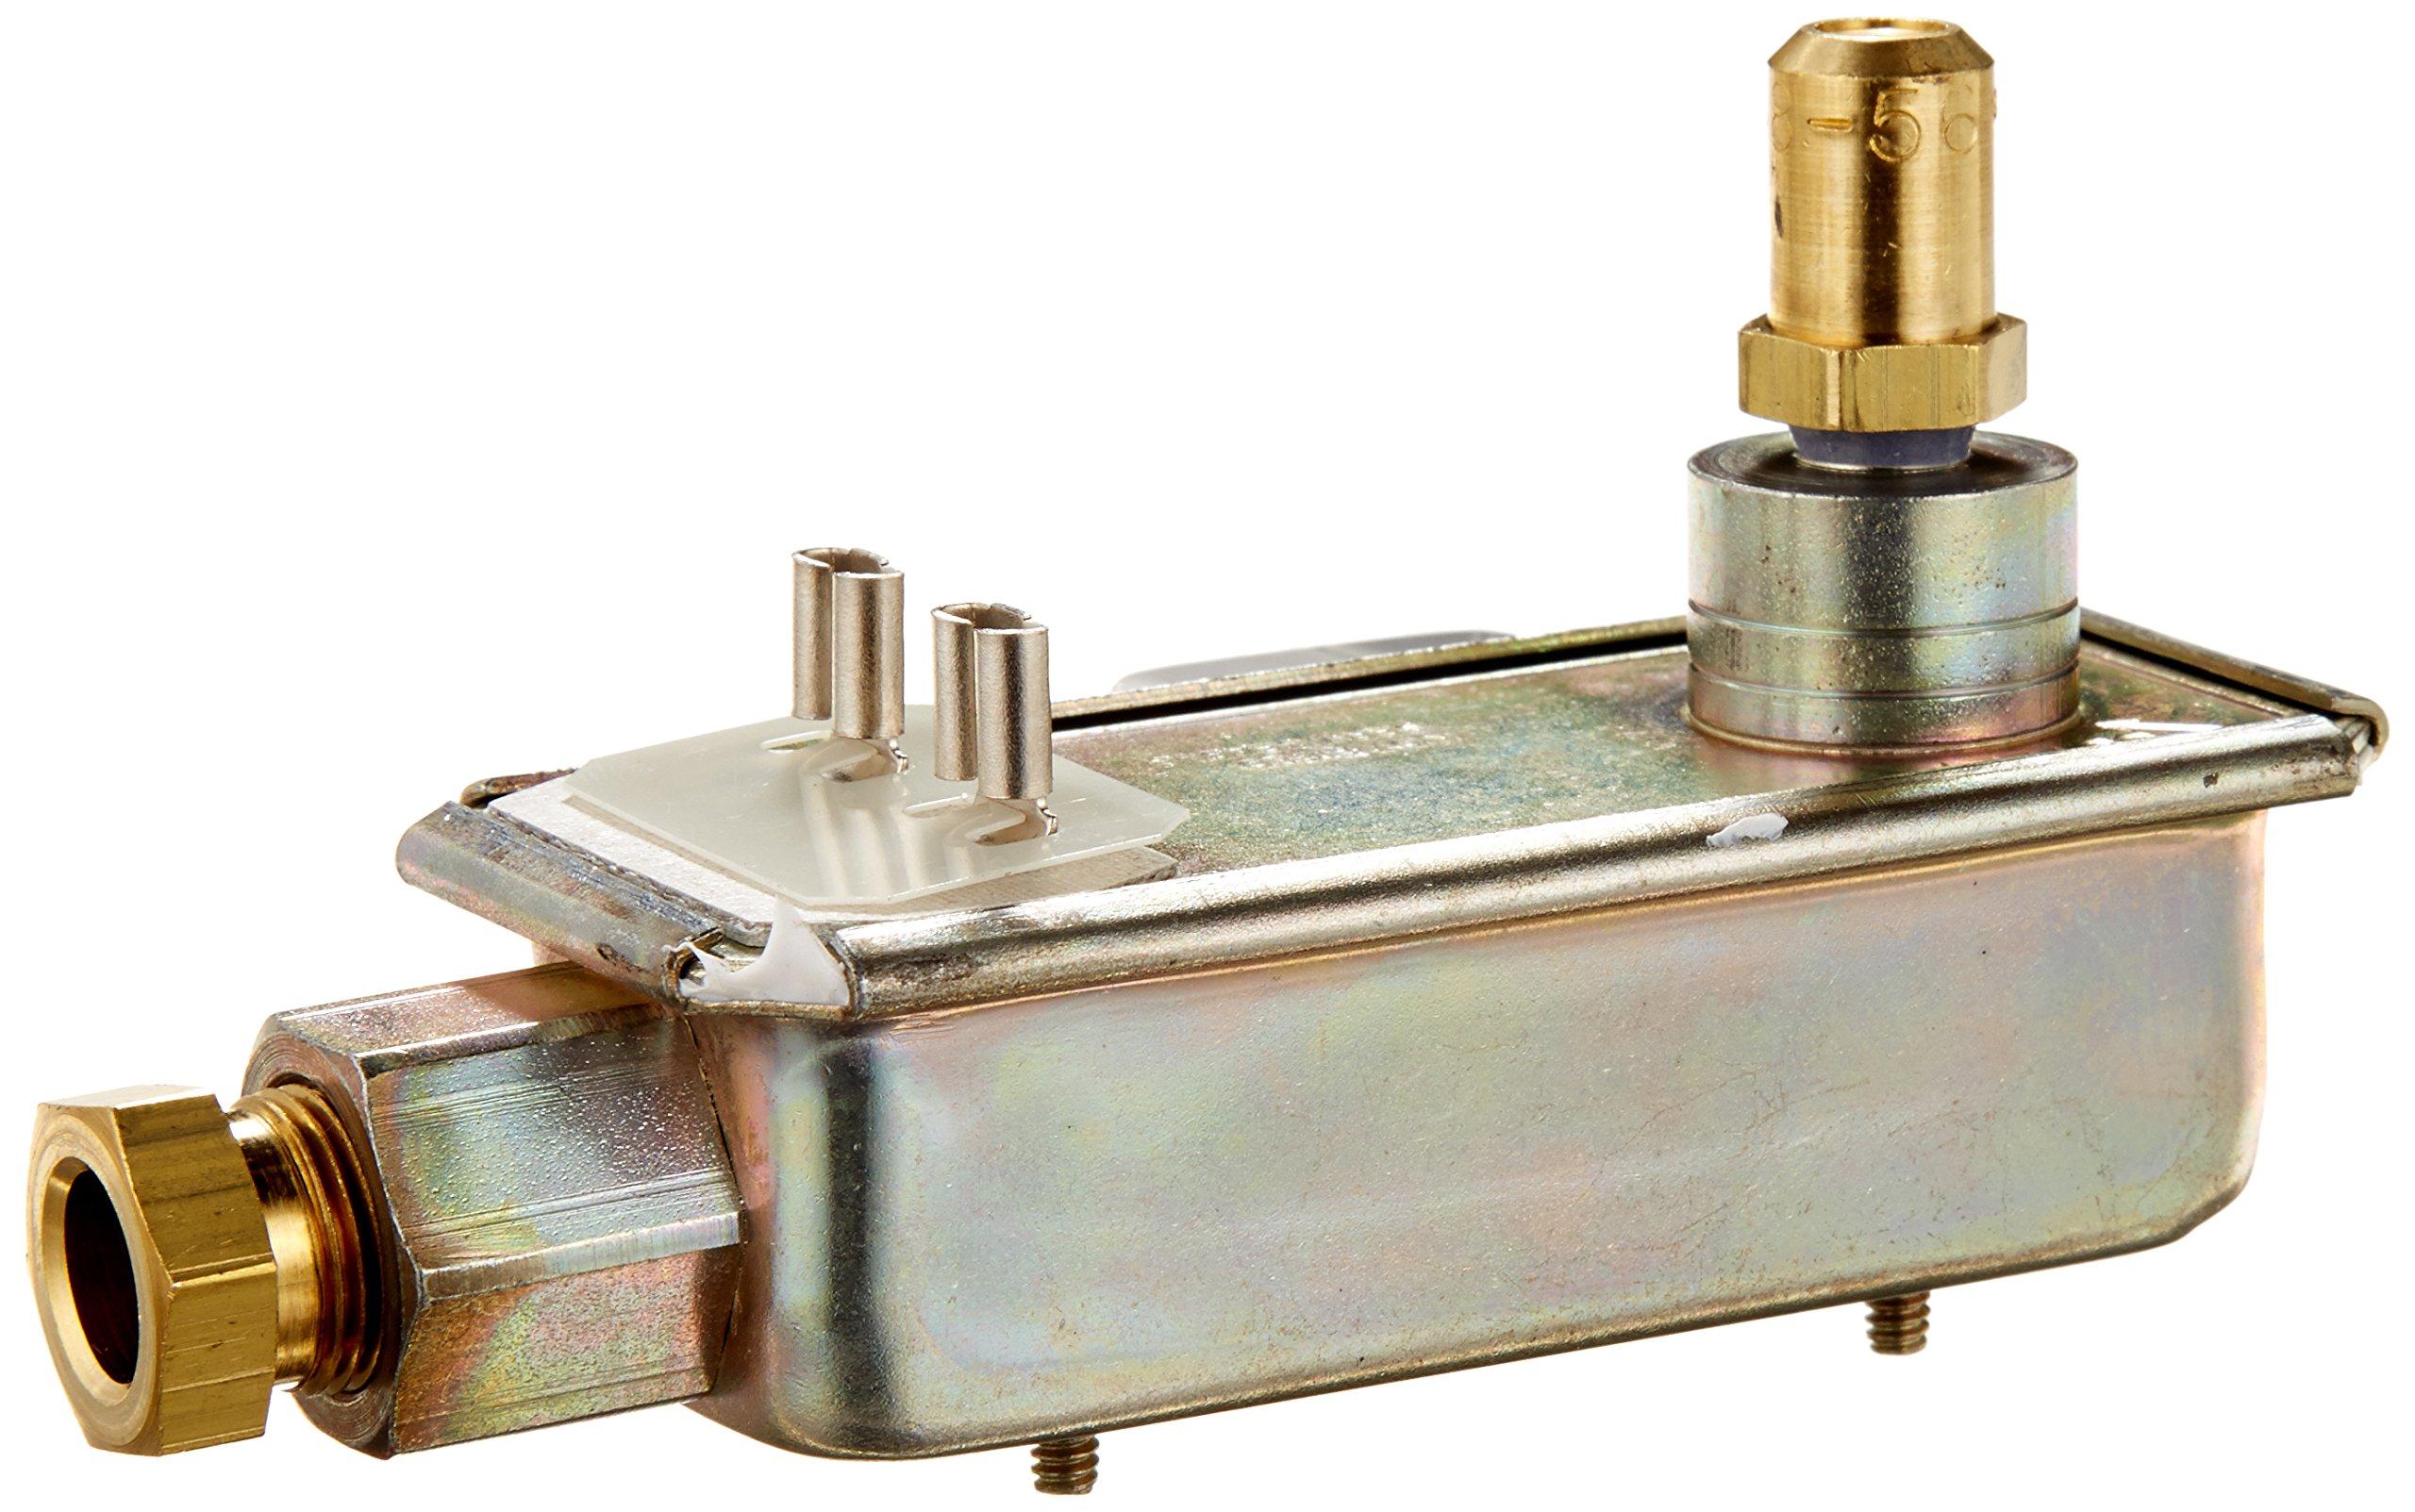 Frigidaire 5308009419 Range/Stove/Oven  Safety Valve